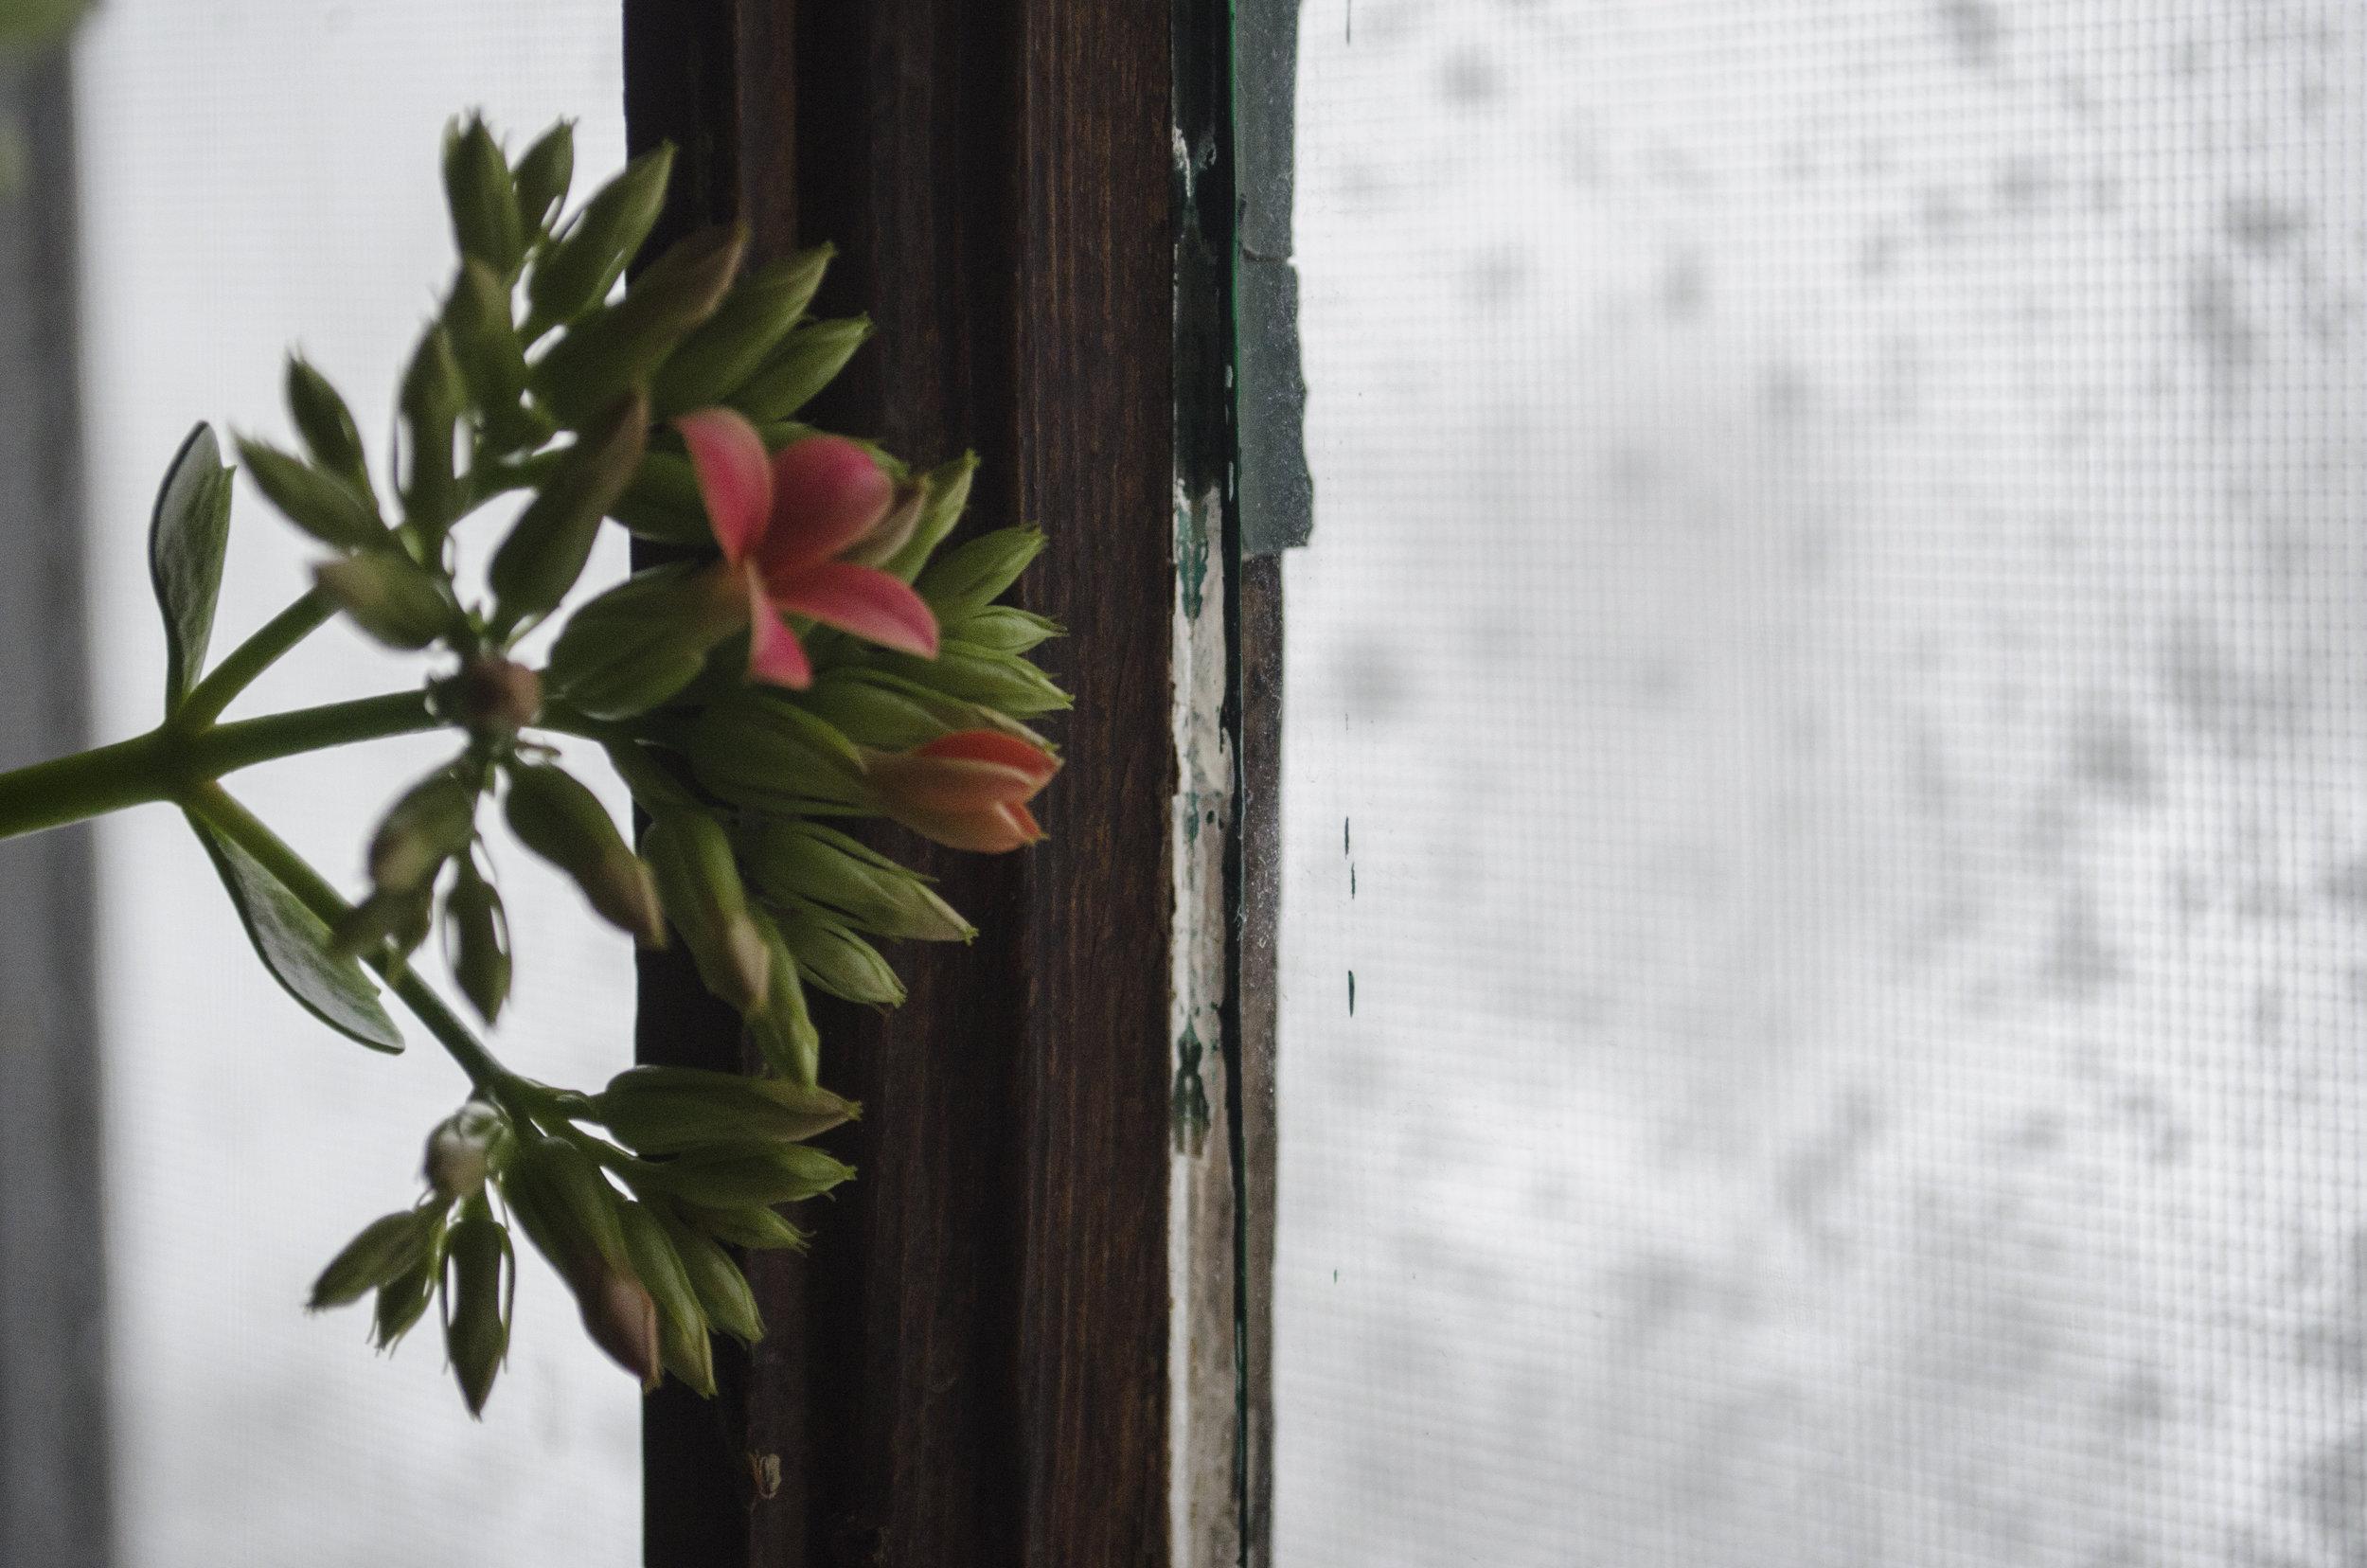 gentle-snow_32703031991_o.jpg